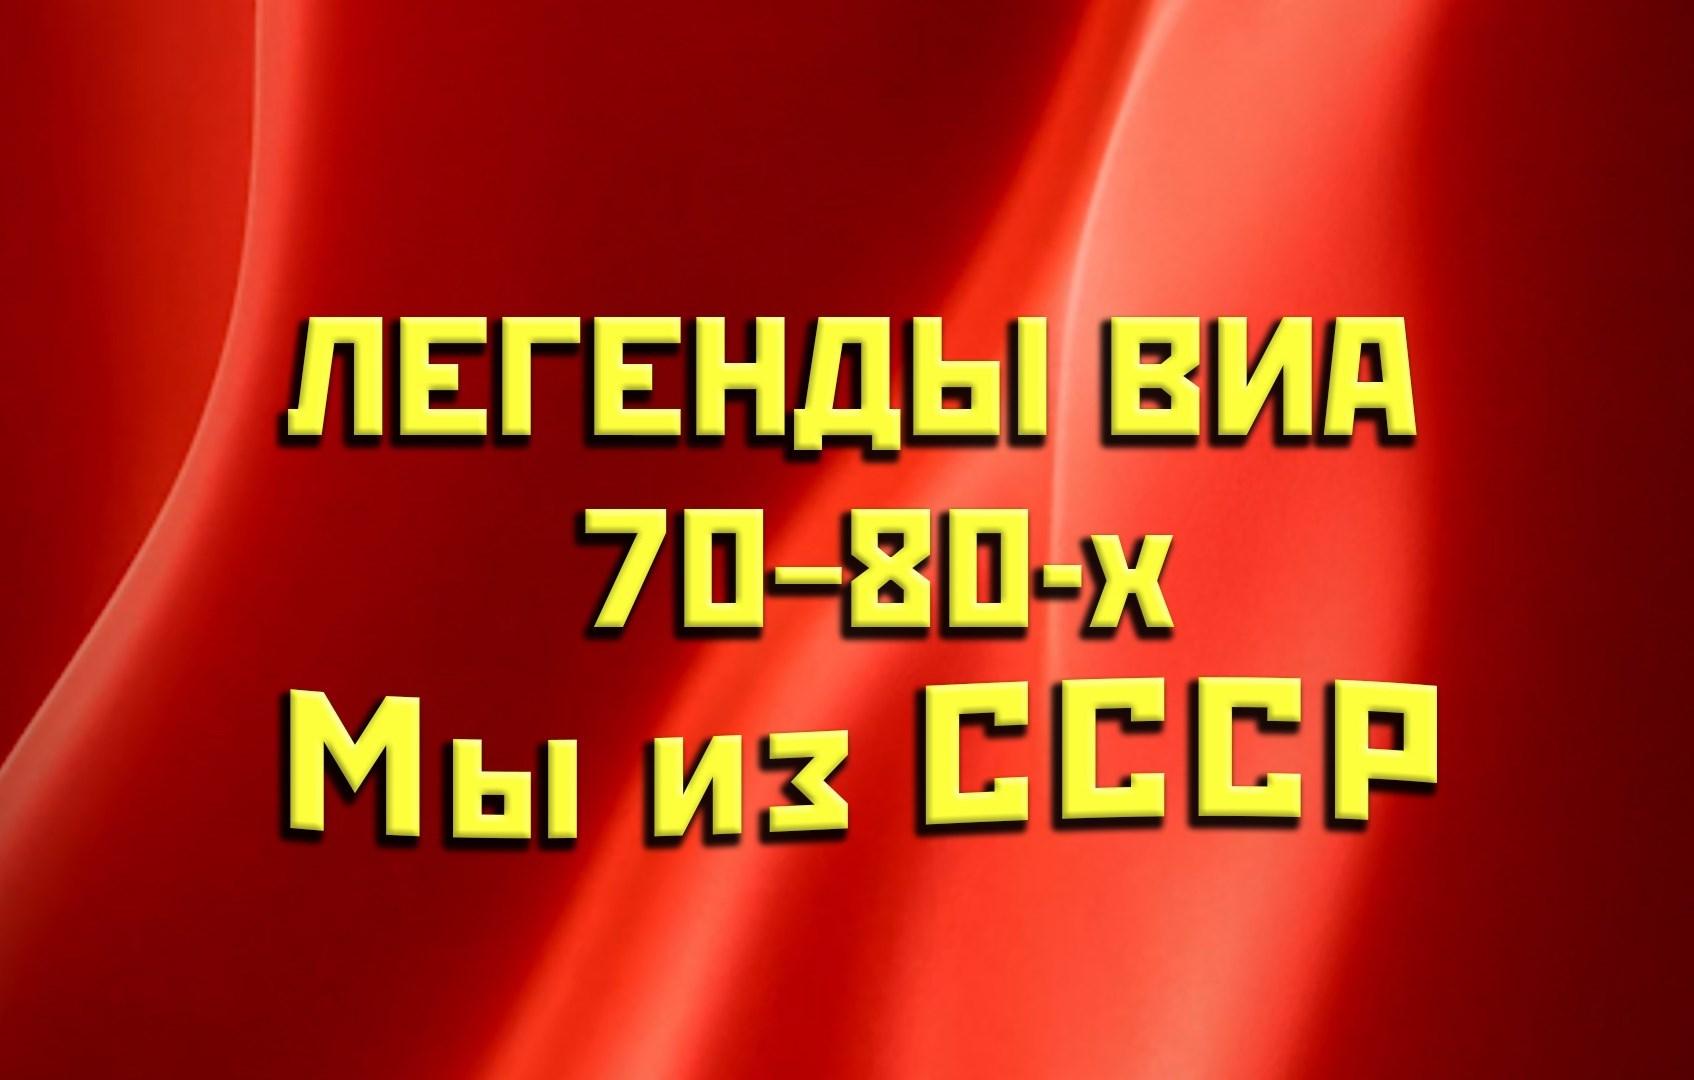 Концерт Легенды ВИА 70-80-х.